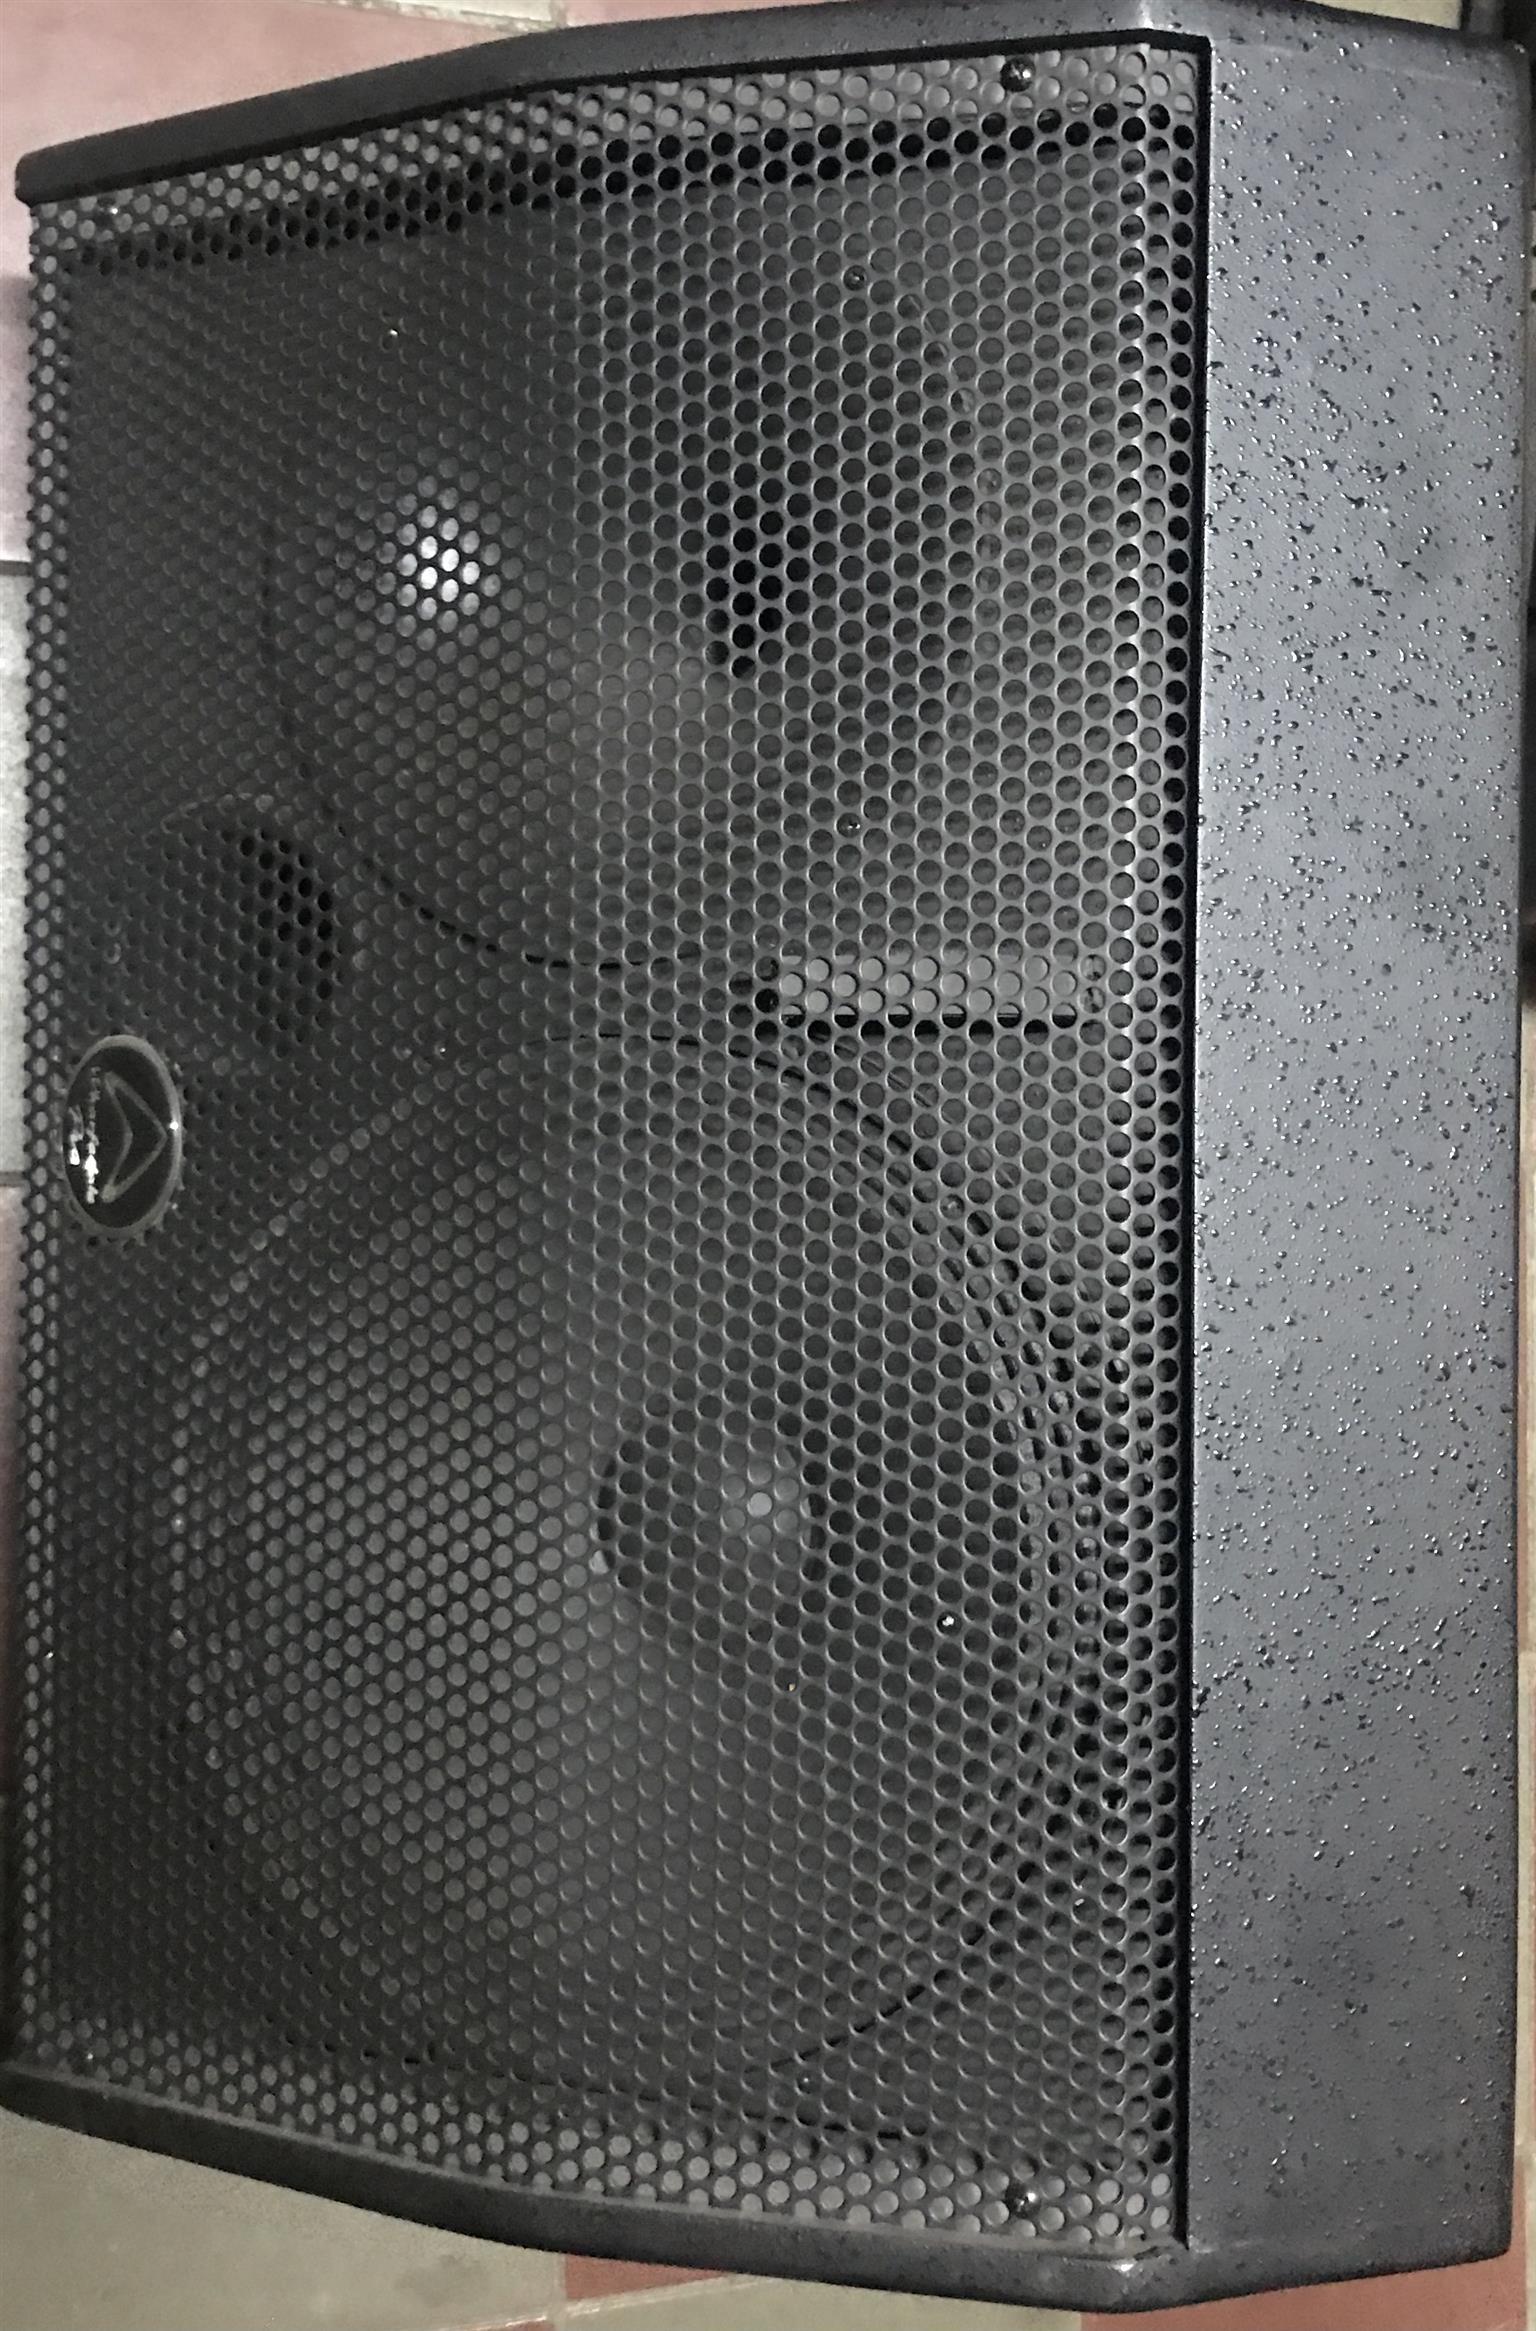 Samson Servo 600 amplifier and 2 Wharfedale stage monitors EVP-X12